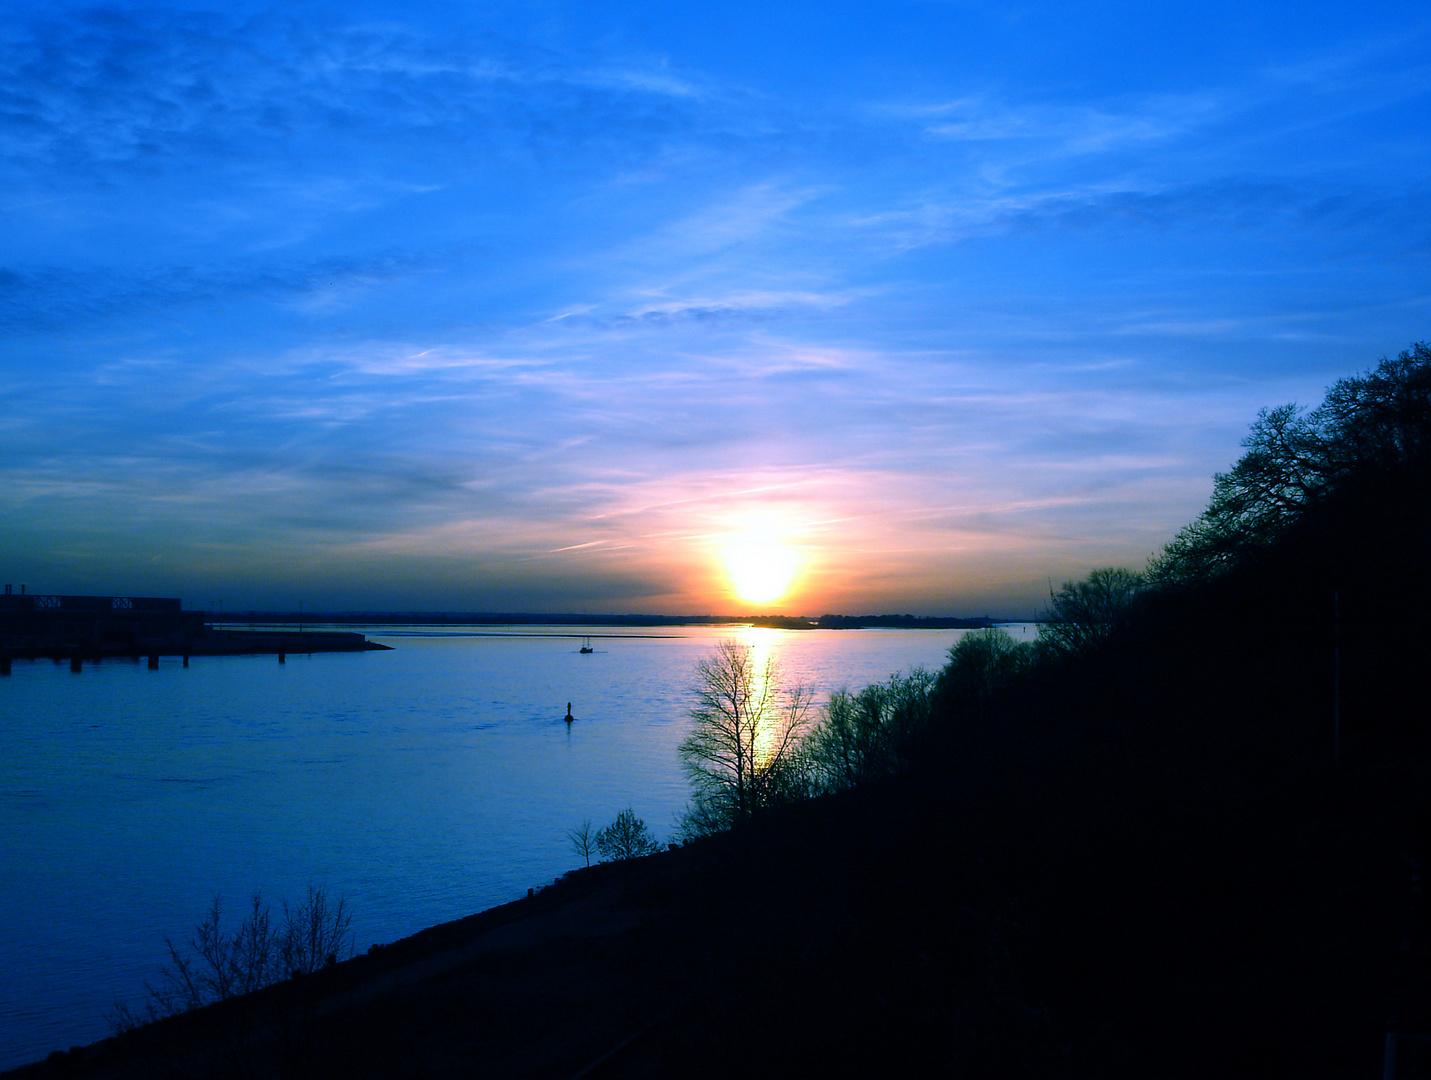 Sonnenuntergang in HH